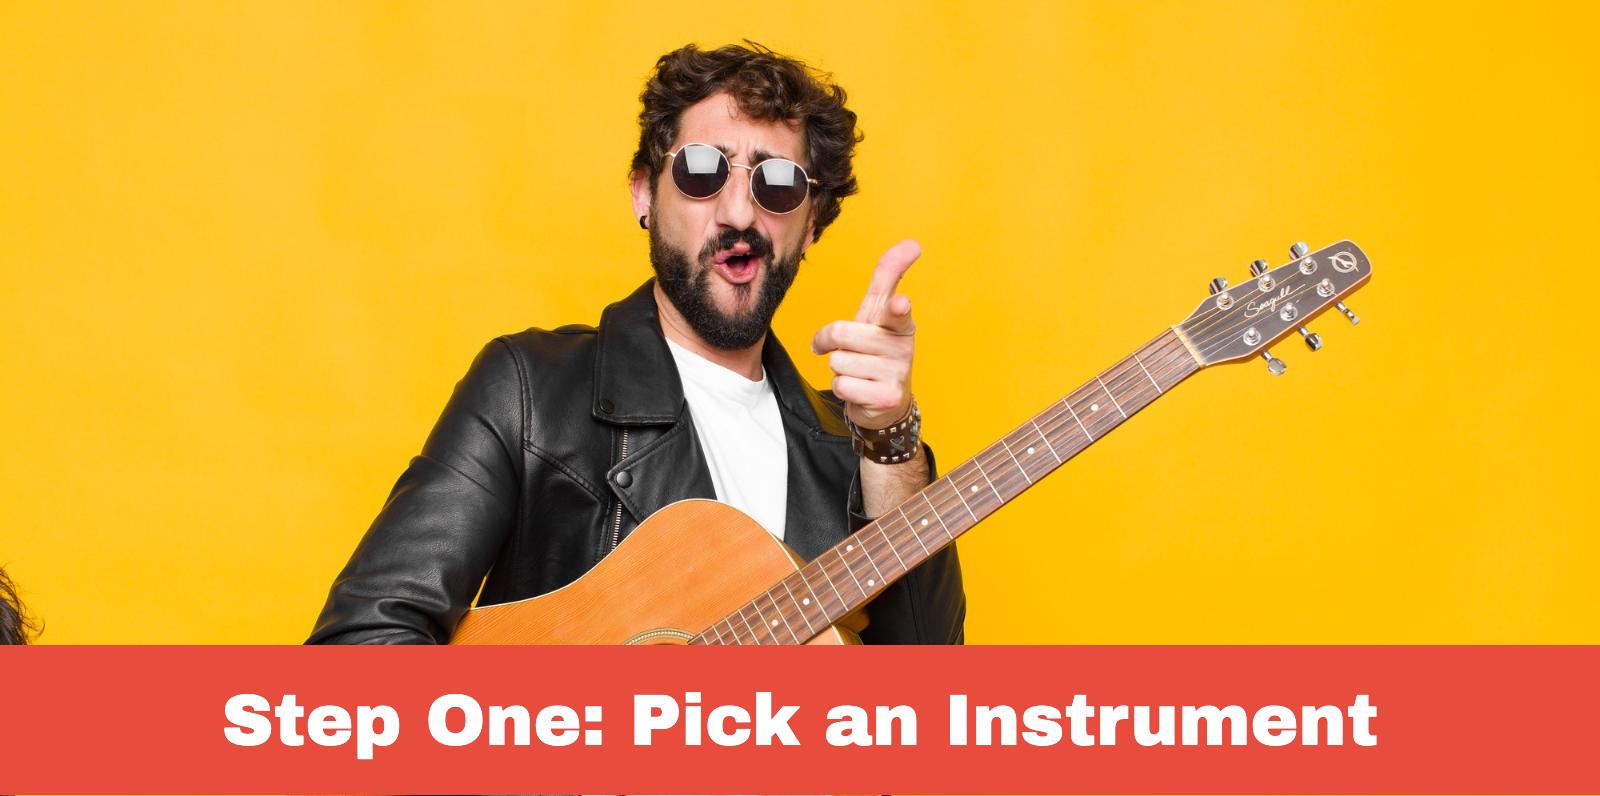 Step 1: Pick an instrument